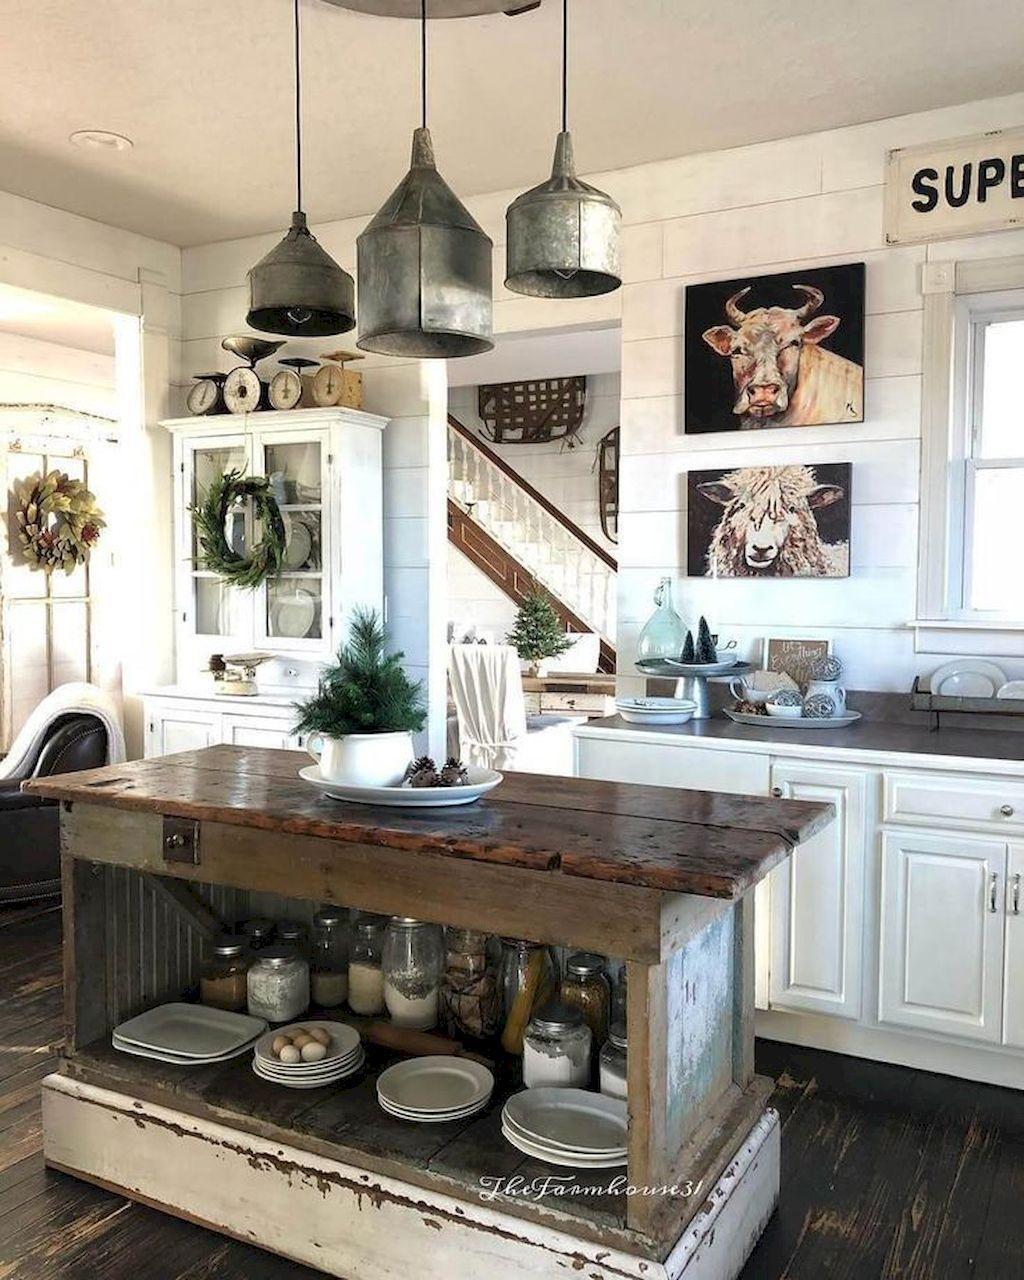 80 Awesome Rustic Farmhouse Kitchen Cabinets Decor Ideas Of Your Dreams Http Proba Farmhouse Style Kitchen Rustic Industrial Kitchen Farmhouse Kitchen Decor